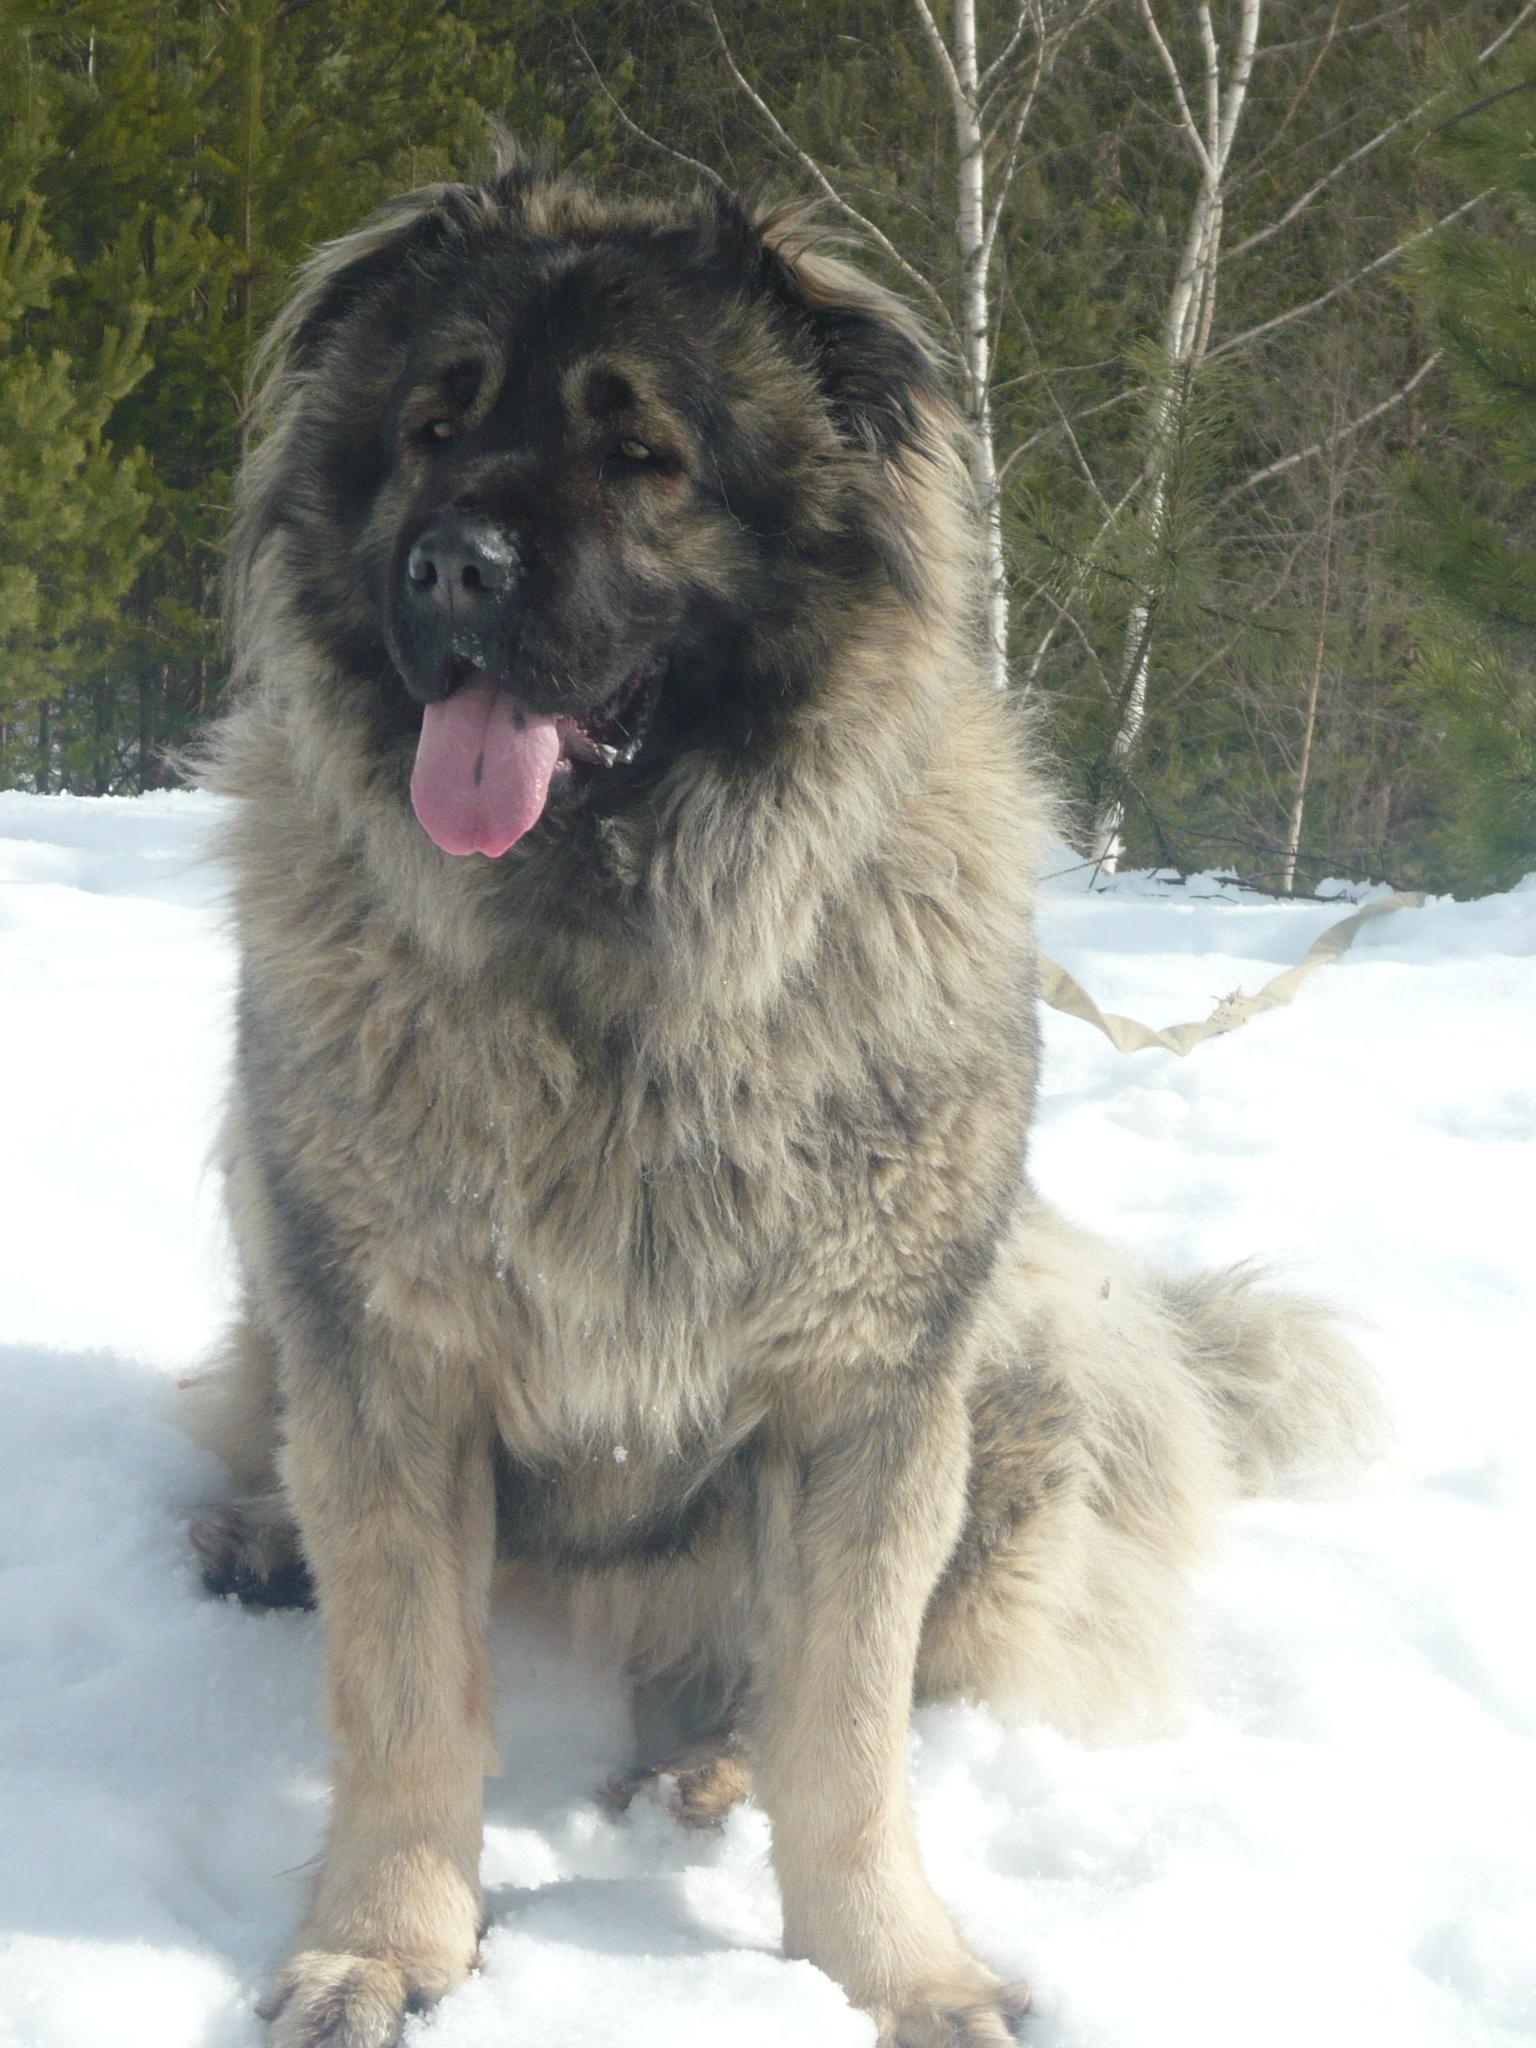 кавказская овчарка Анри, Caucasian Shepherd dog Anri, kavkazskaya ovchaka Anri